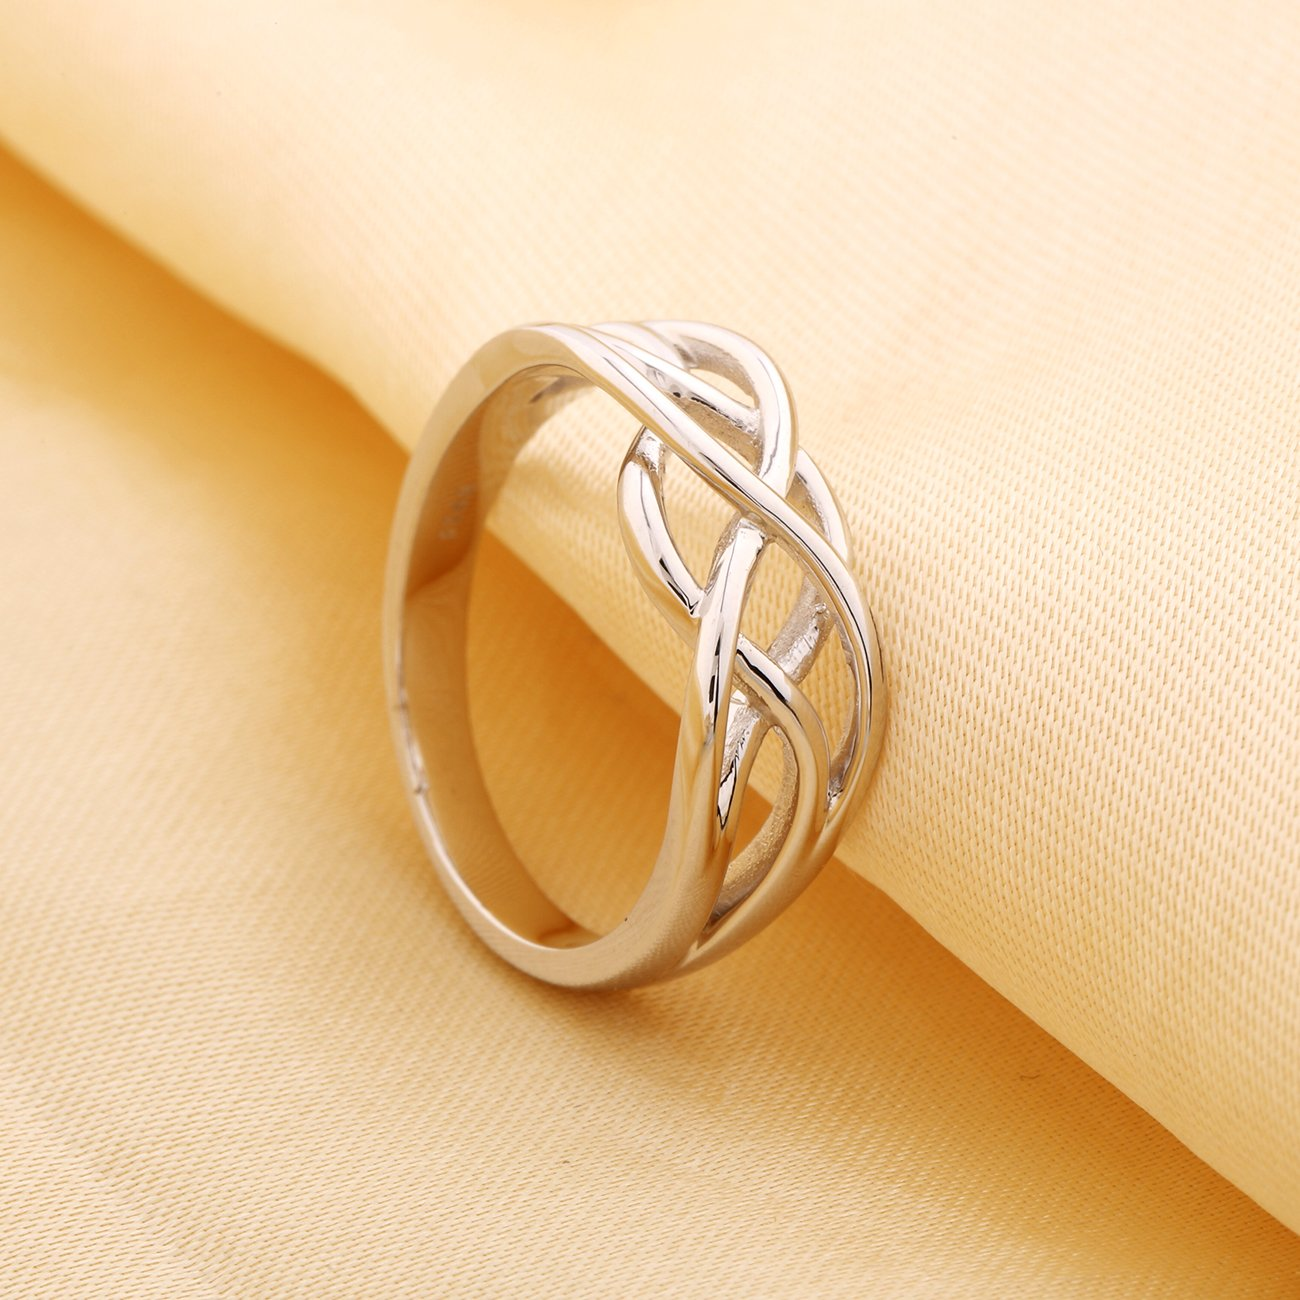 GULICX 925 Sterling Silver Ring Celtic Everlasting Love Knot Filigree Wedding Finger Ring Size R